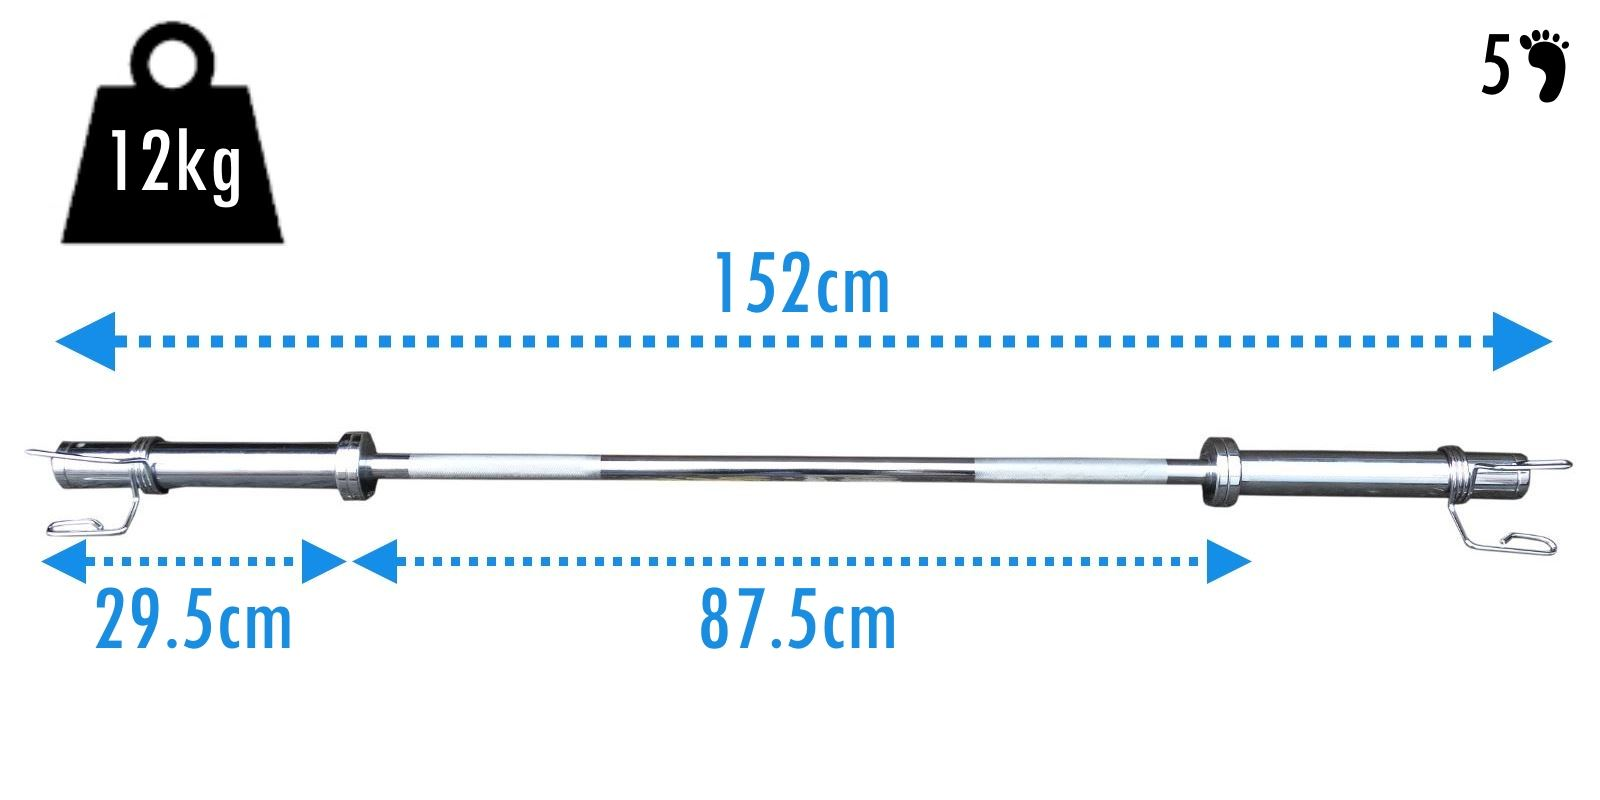 Bodyrip Olympic Bar Barbell Weight Plate Lifting 5